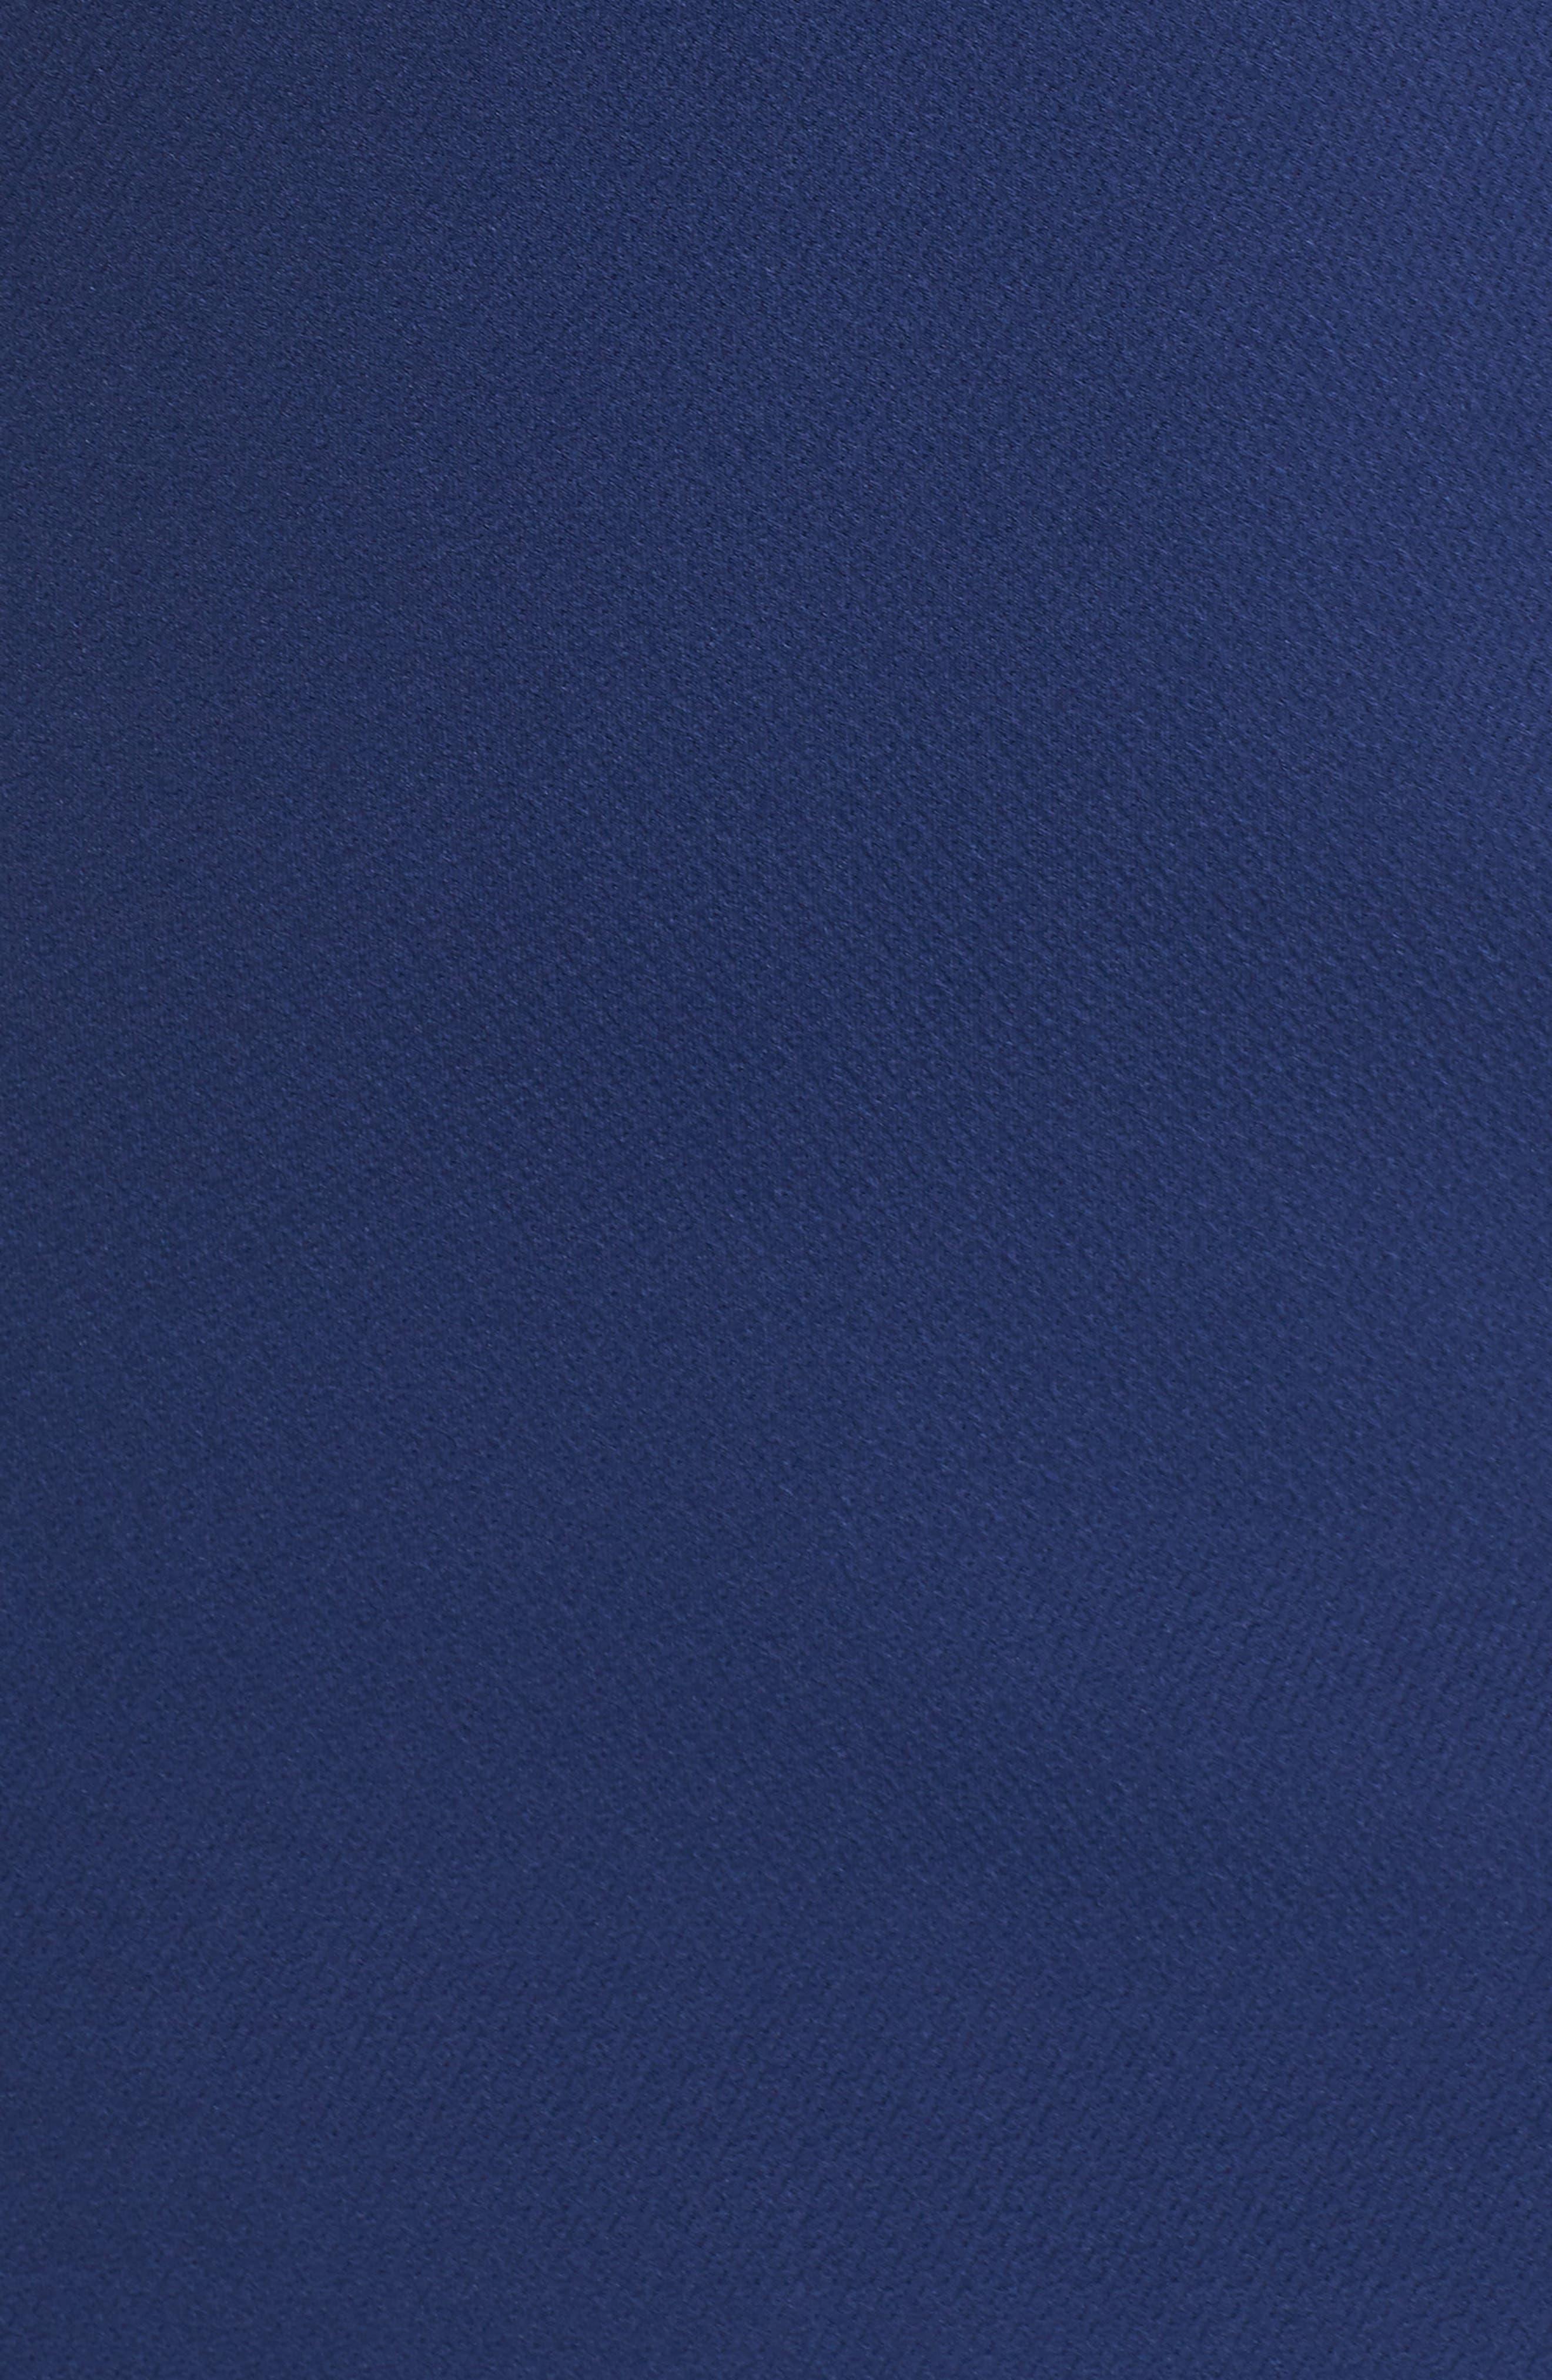 Evelyn Colorblock Sheath Dress,                             Alternate thumbnail 6, color,                             460